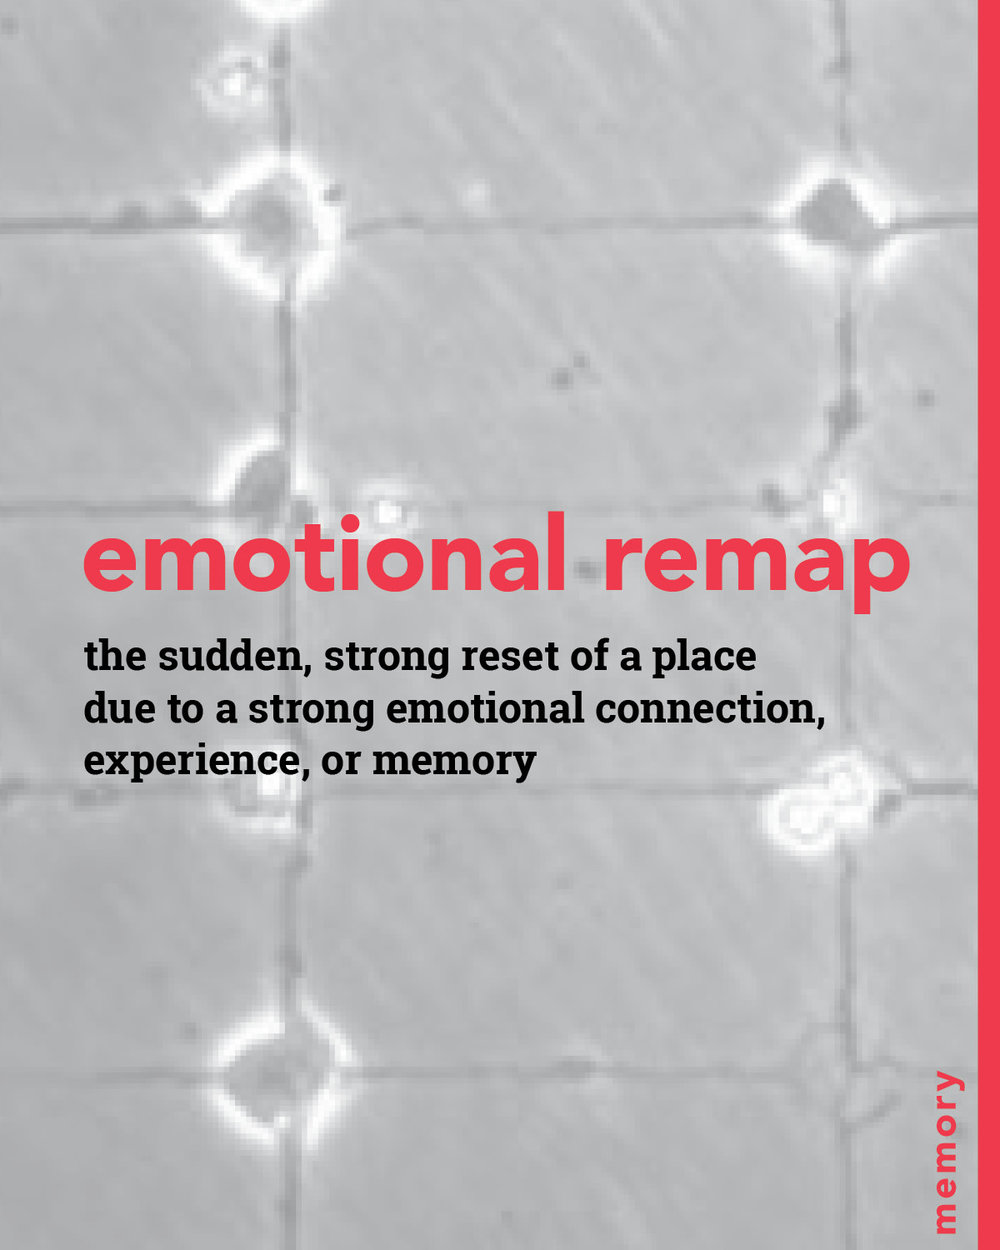 emotionalcards8.jpg